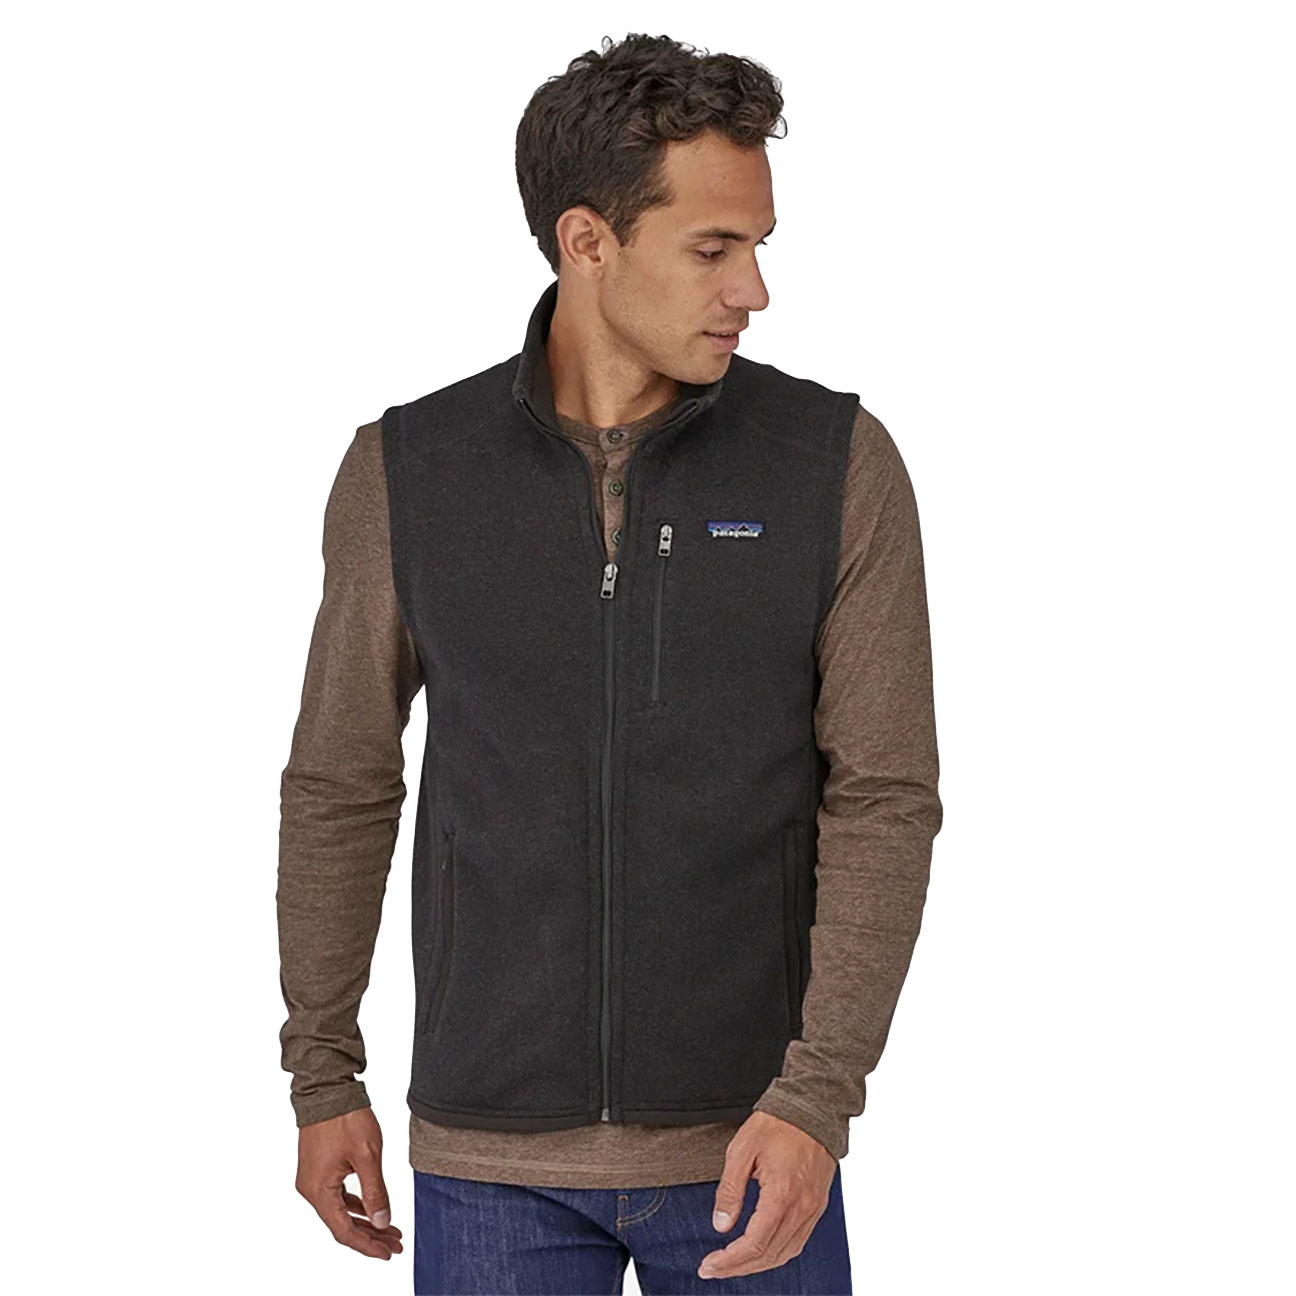 Men's Better Sweater Fleece Vest, Black-4